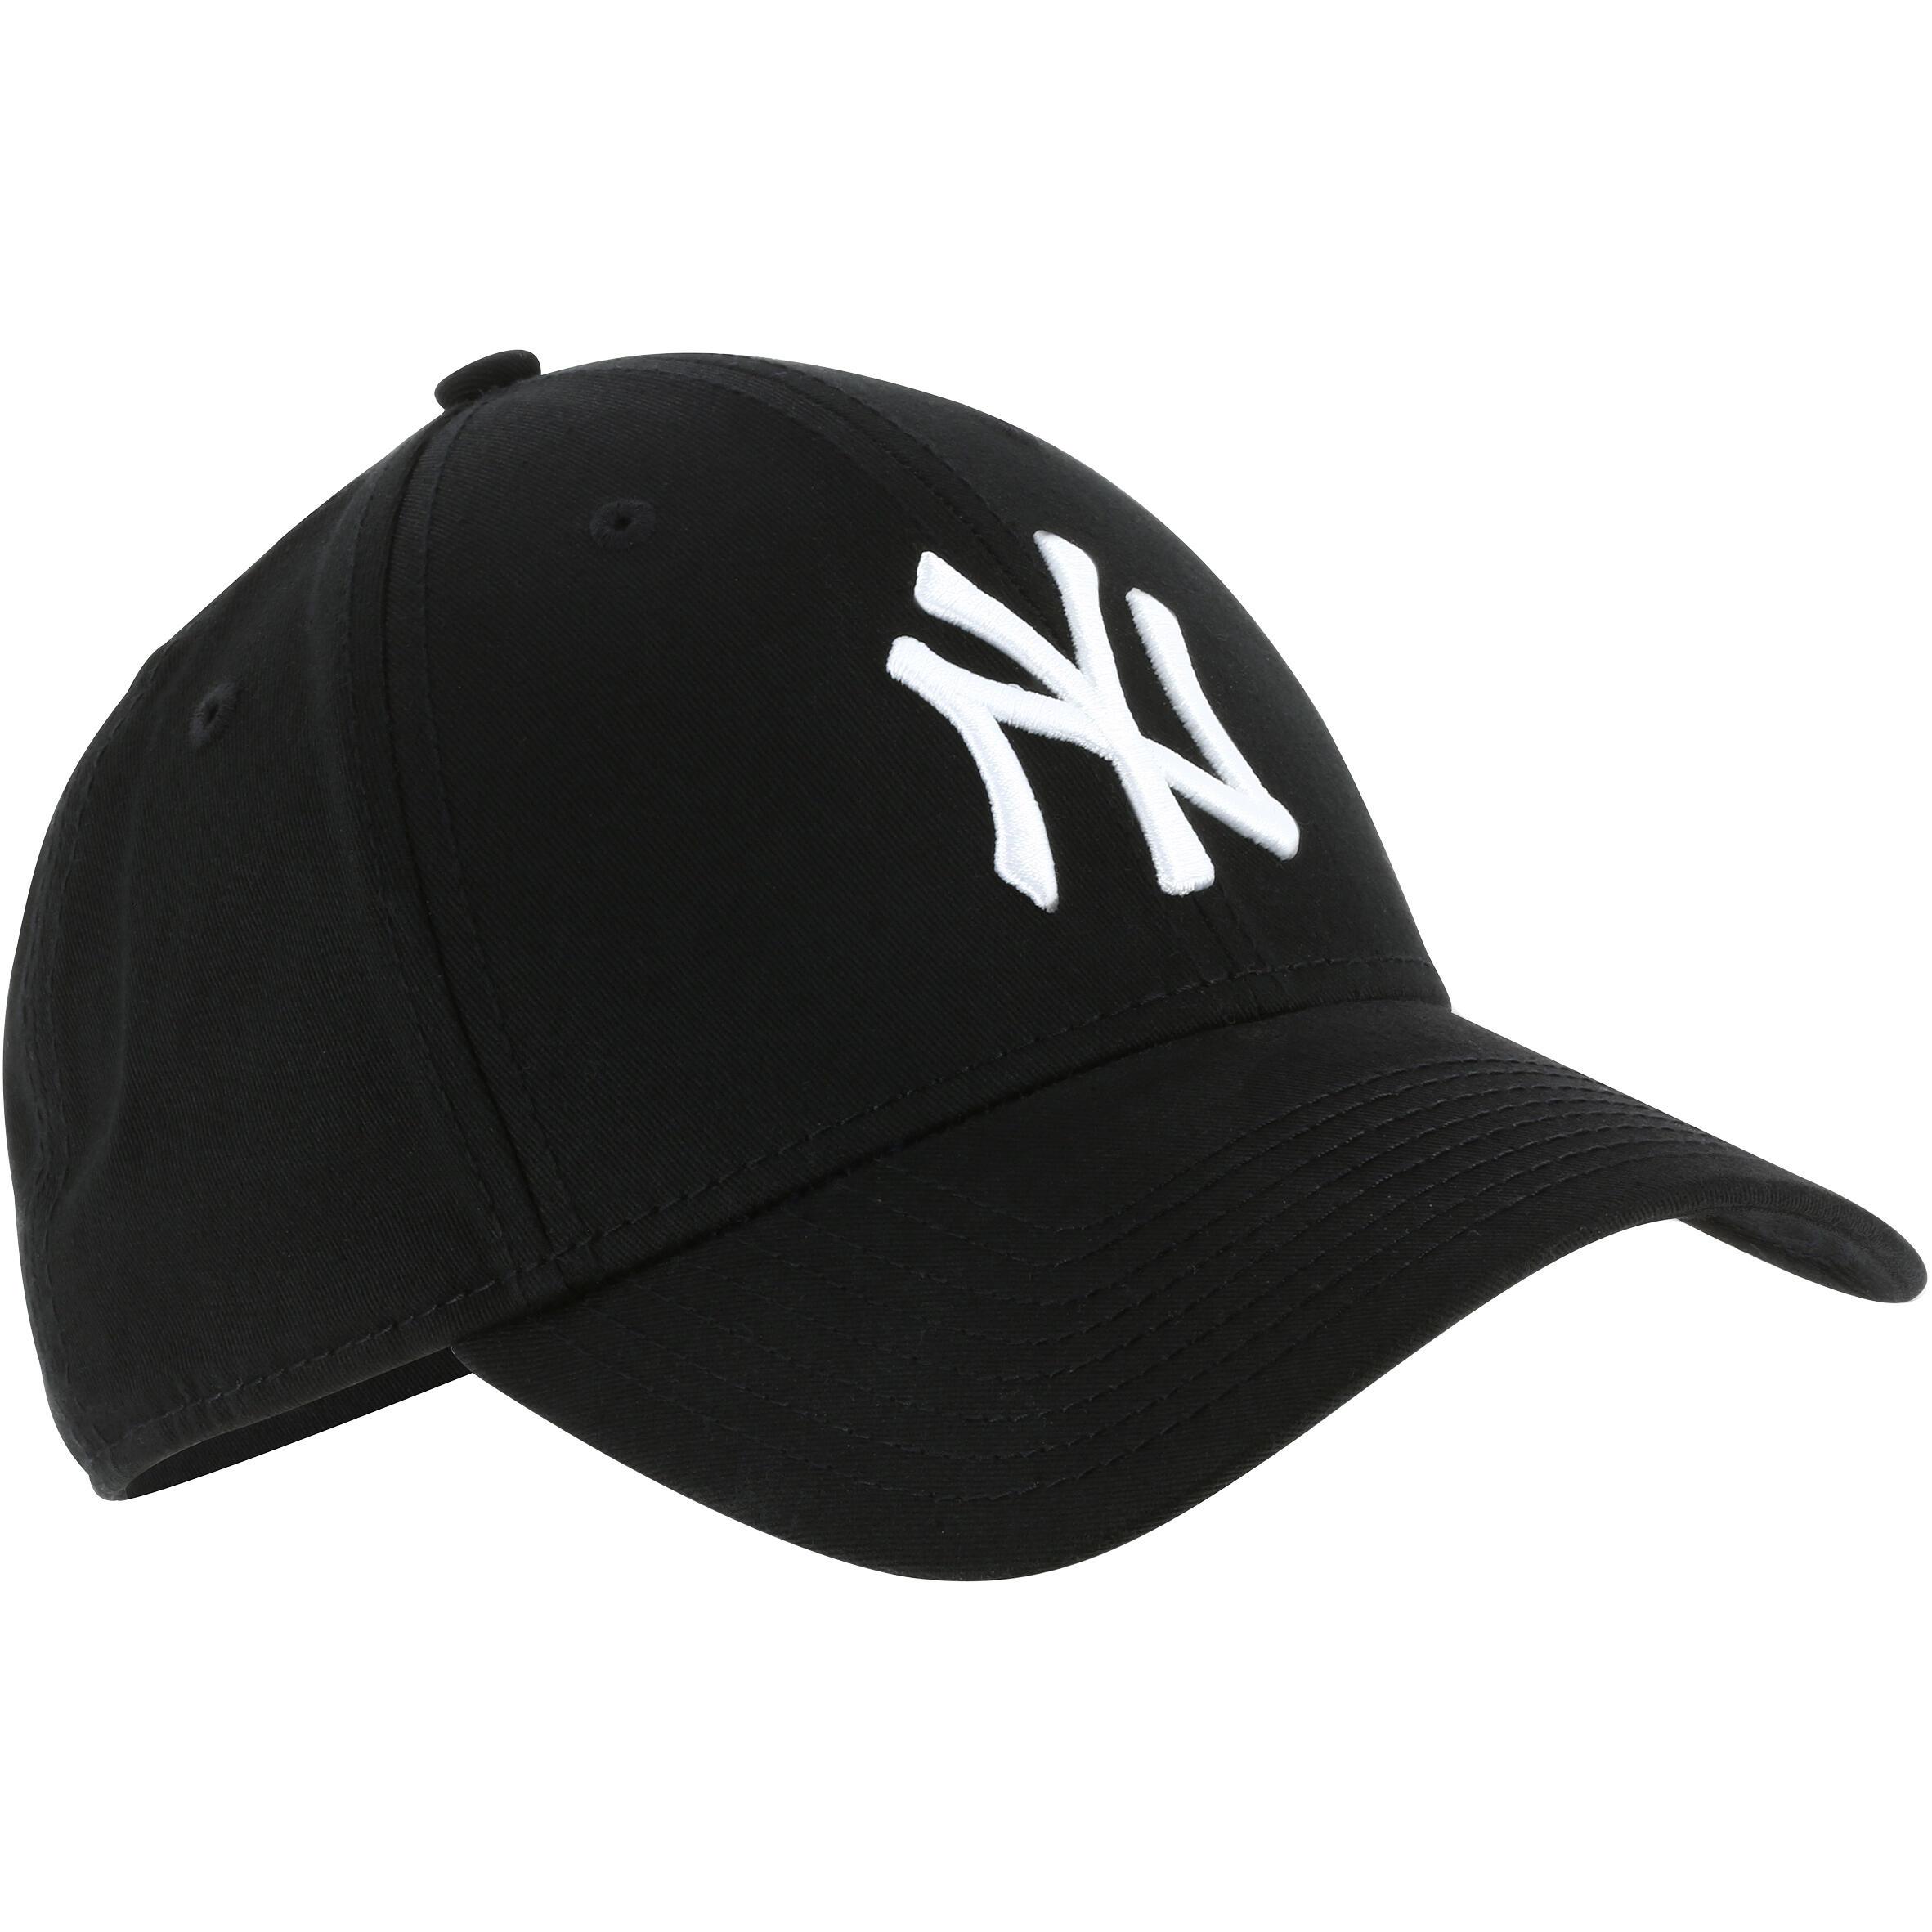 966491d37aa05 Gorra Plana de Béisbol para Adultos New York Yankees Negro New era ...